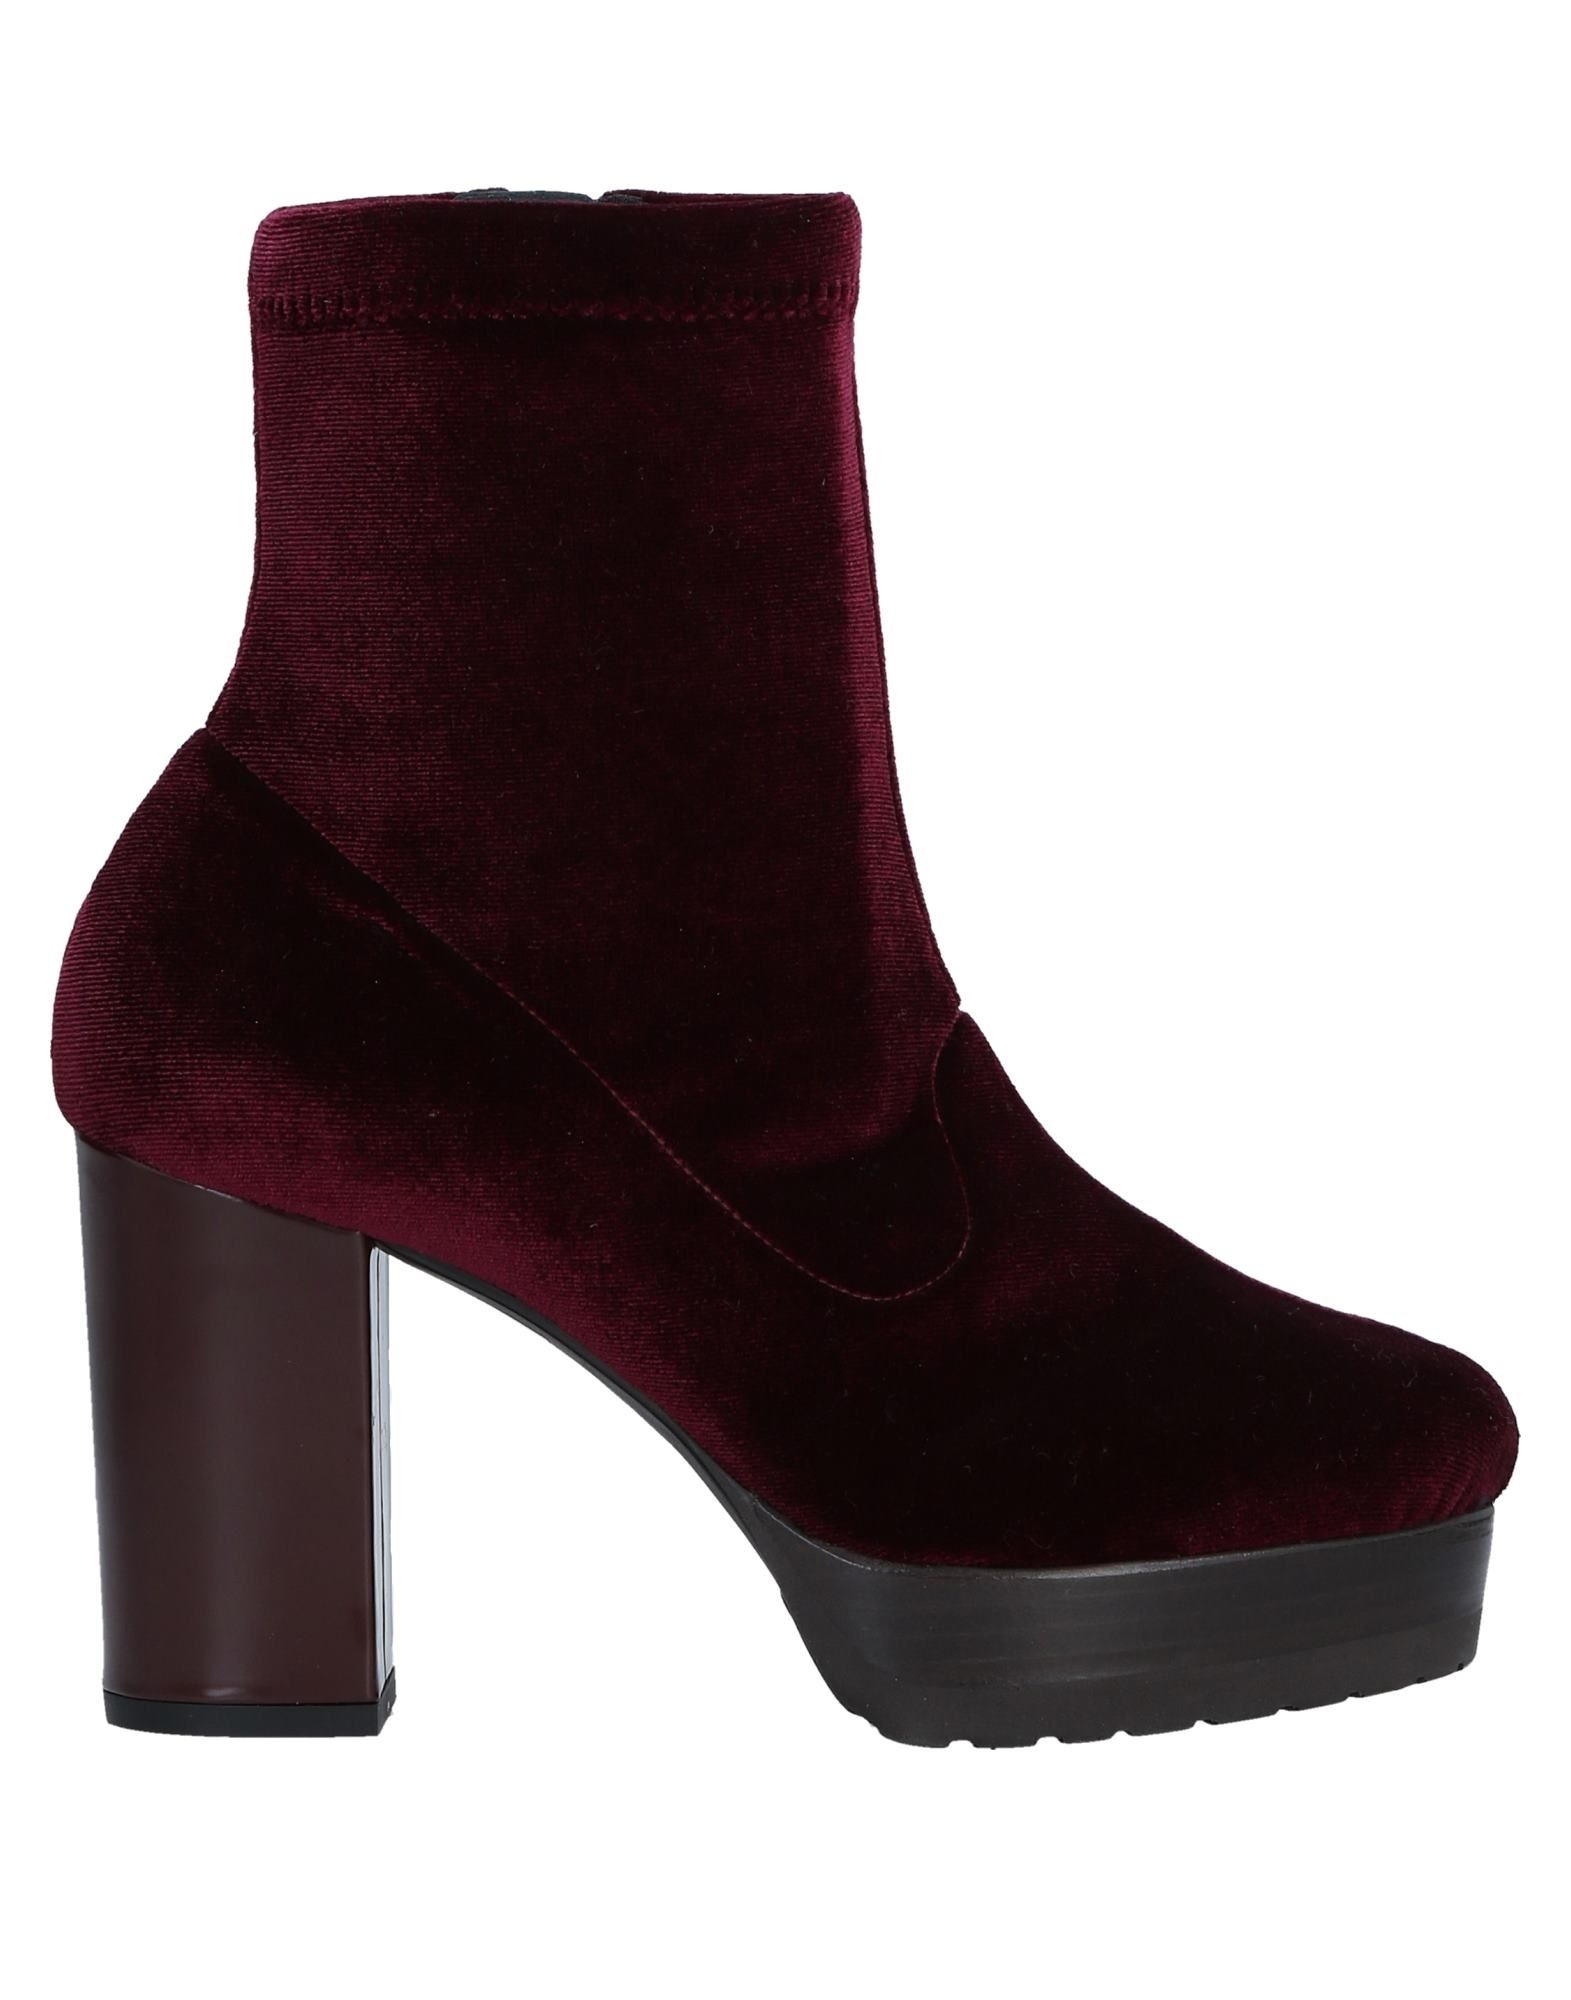 Guido Sgariglia Stiefelette Damen  11538119CK Gute Qualität beliebte Schuhe